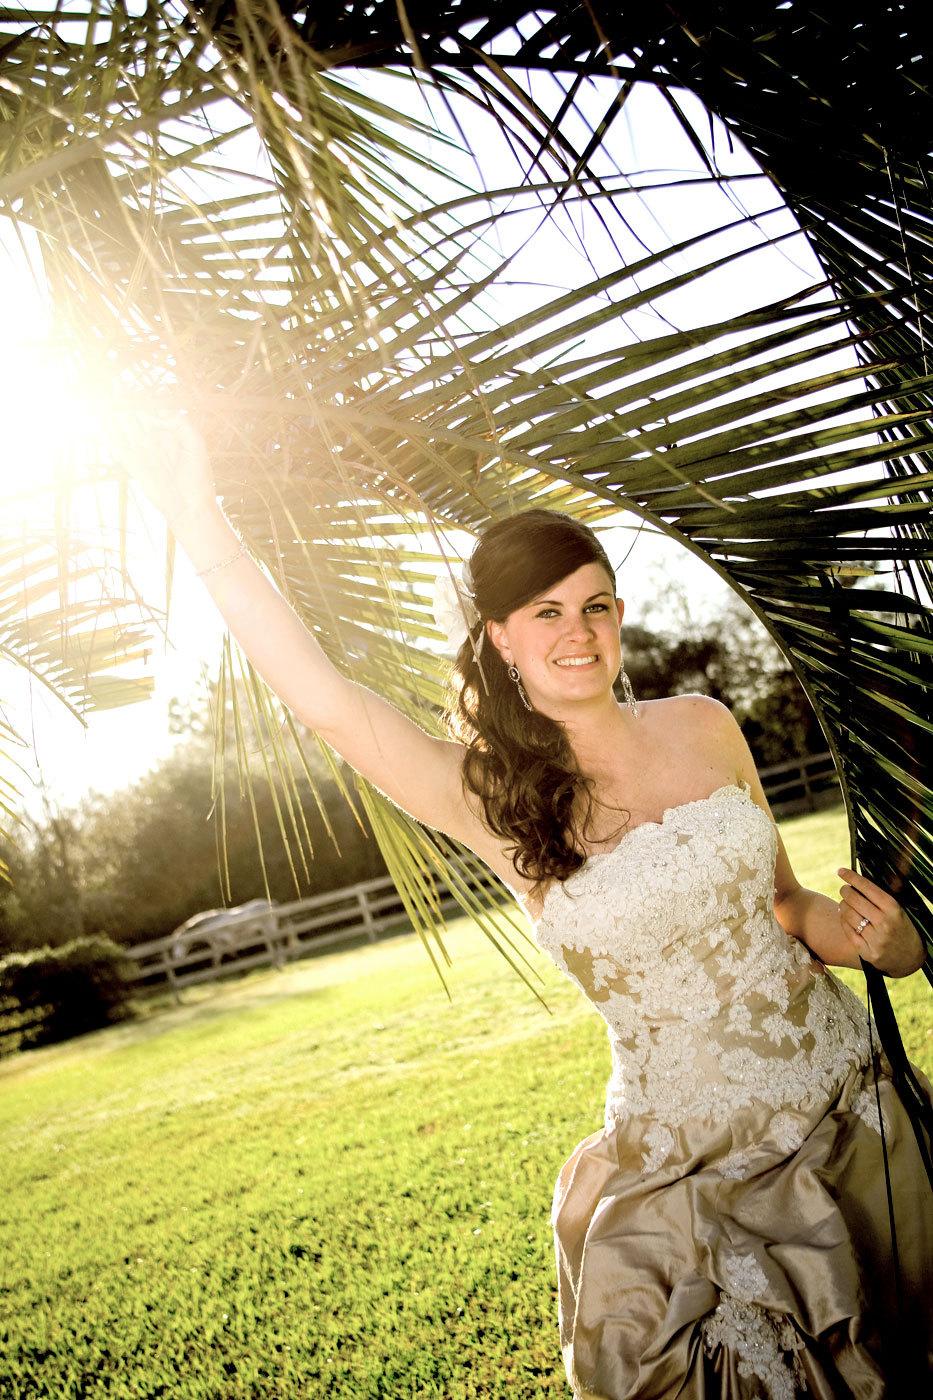 Bride, Bridal, Sacred image photography